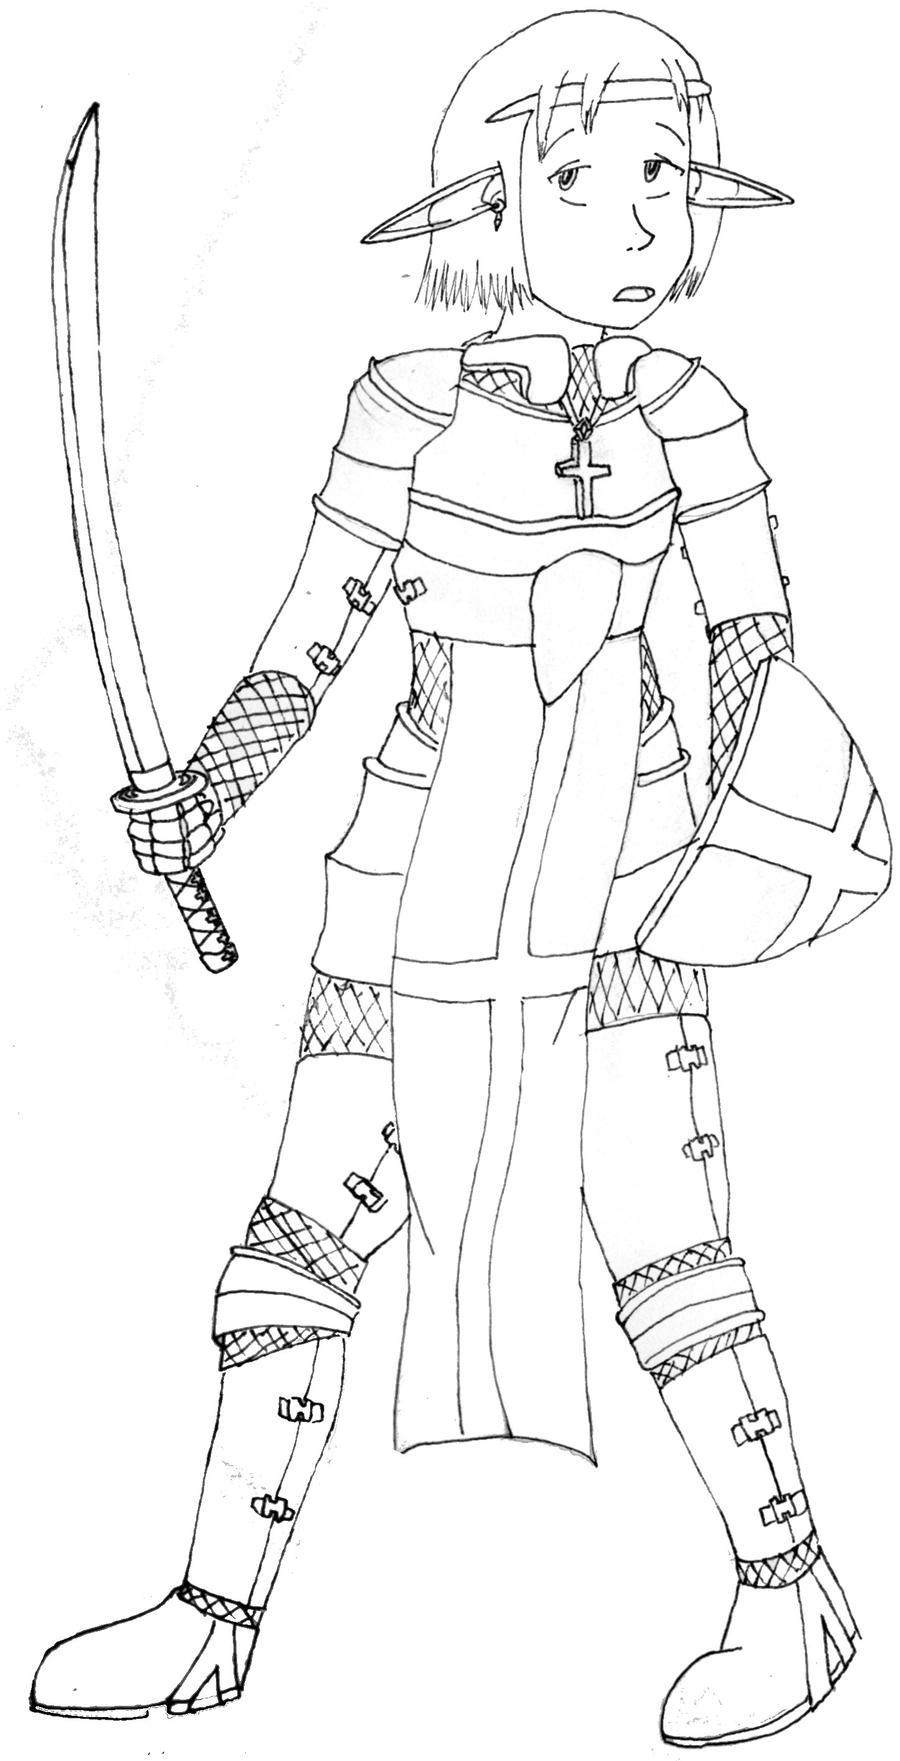 Character_Design__Amaya_by_Masaki_no_kitsune.jpg